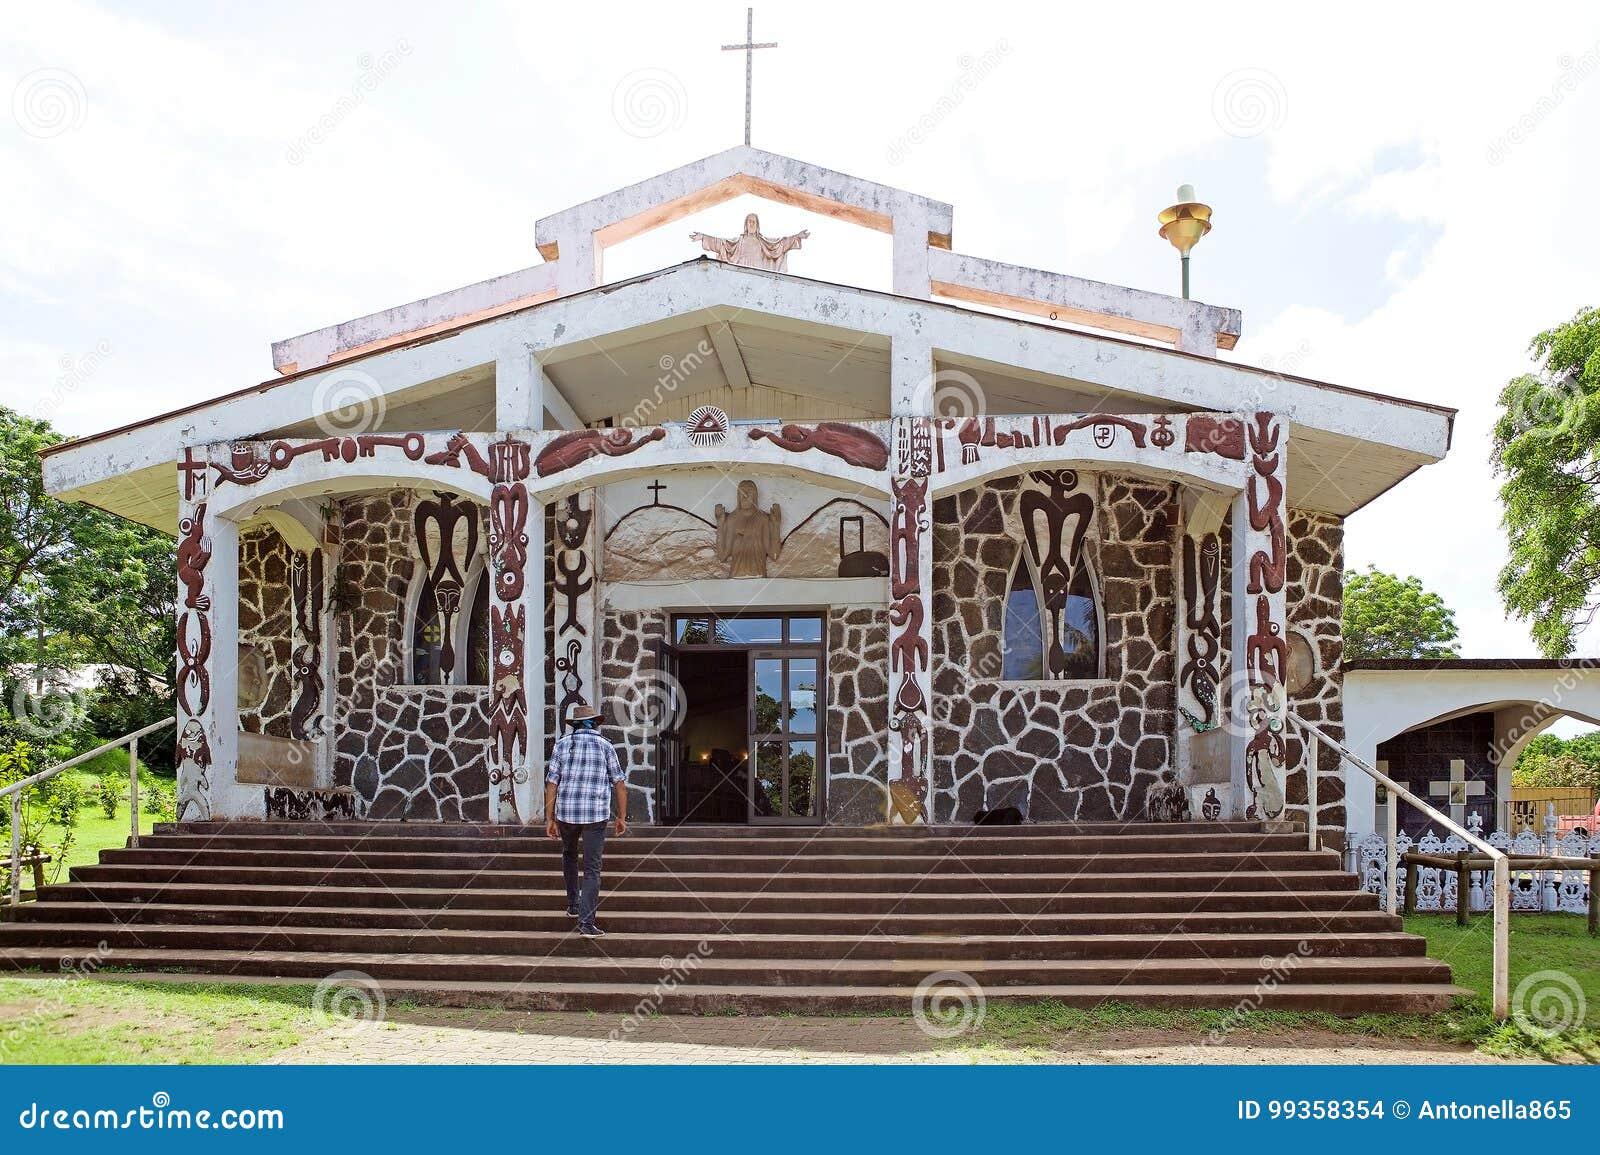 Iglesia en la isla de pascua, Chile